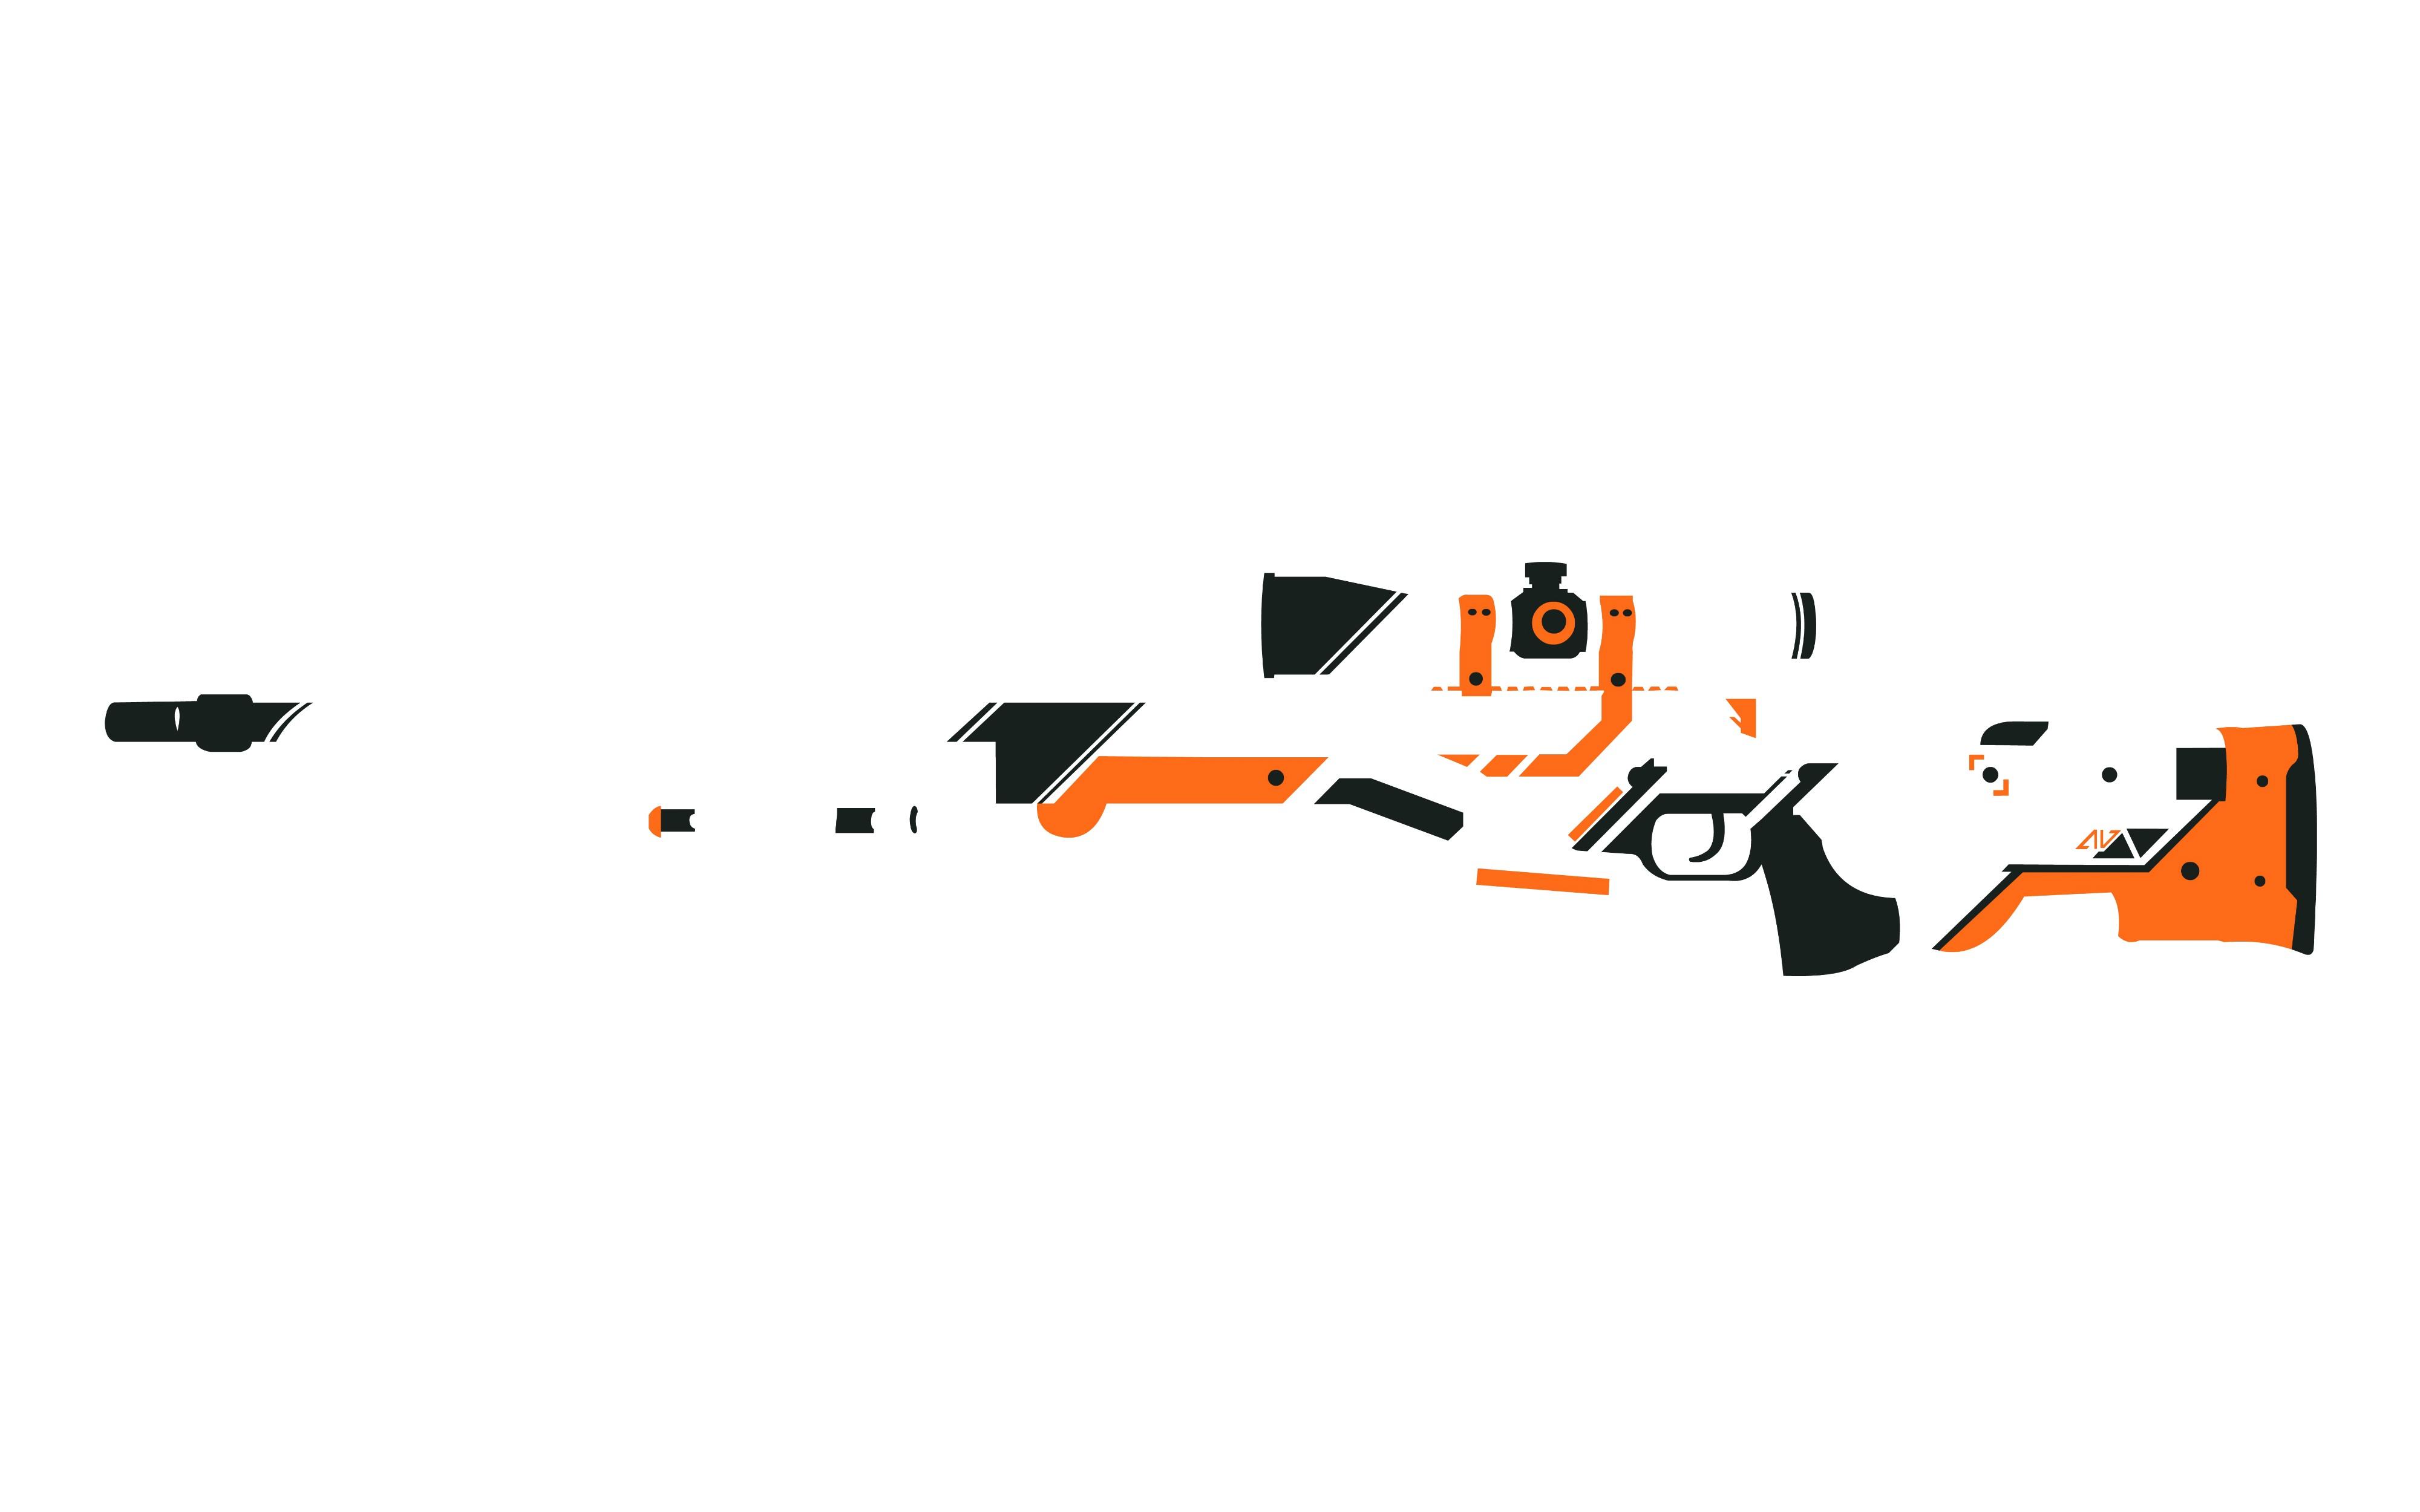 Wallpaper : illustration, minimalism, text, logo, Counter Strike ... clip art royalty free